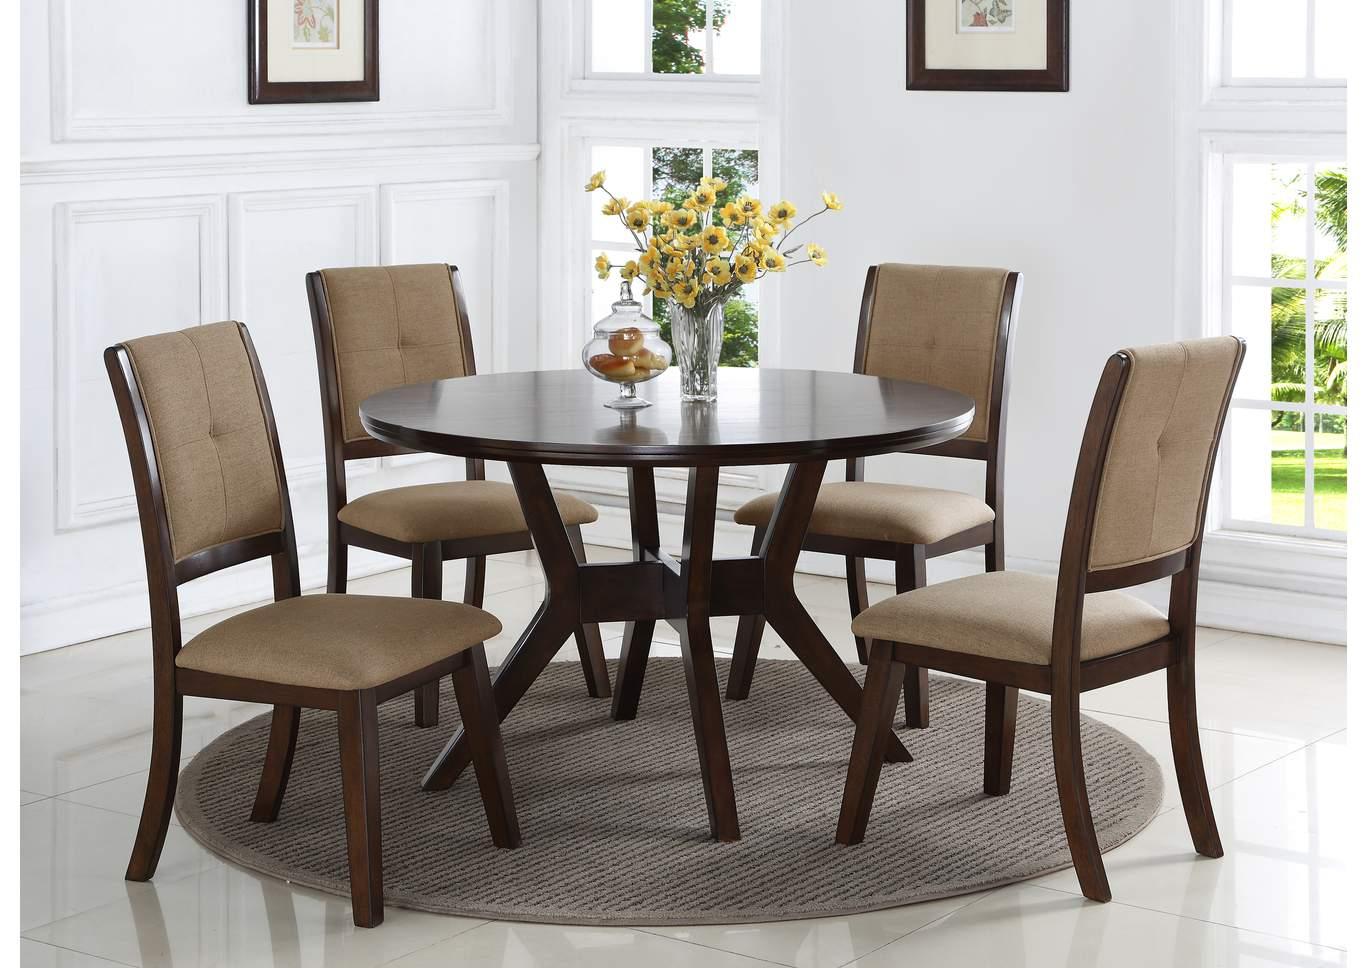 upholstered dining room set value city furniture barney upholstered dining chair set of 2crown mark the furniture shop duncanville tx